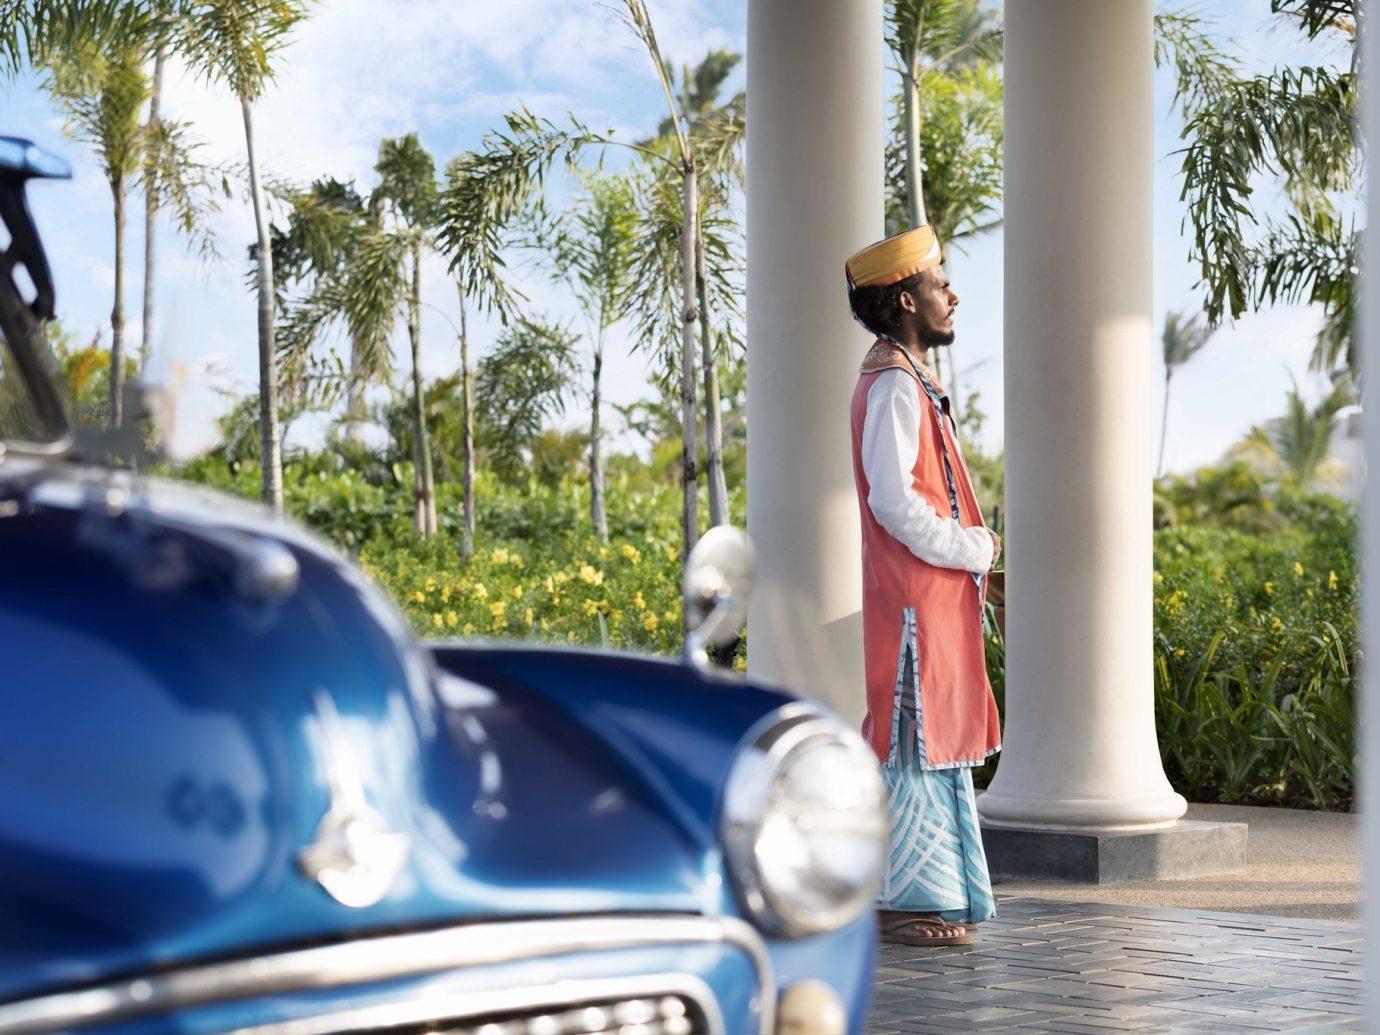 Trip Ideas tree sky outdoor car vehicle luxury vehicle